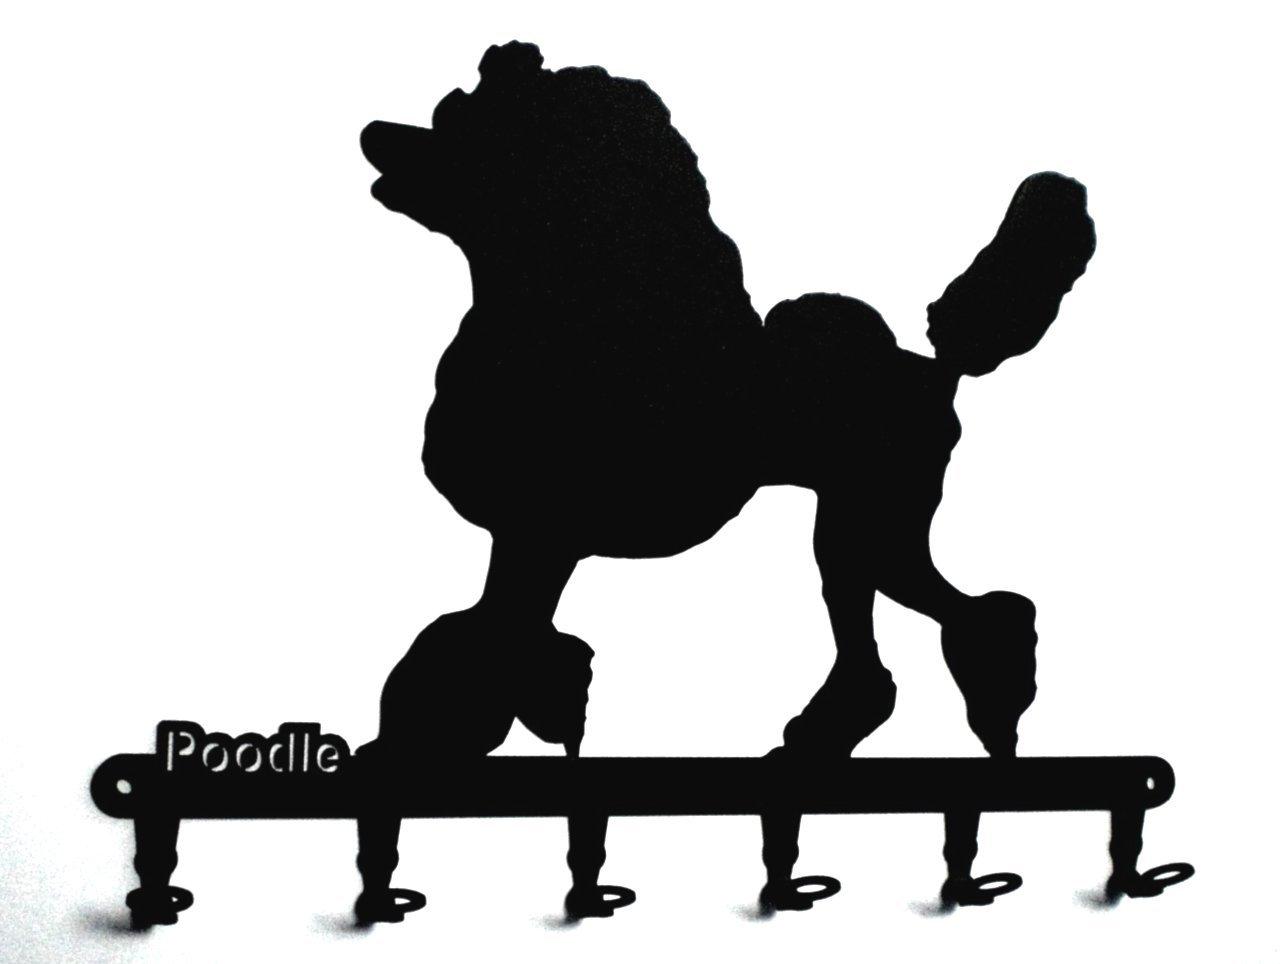 Ganci portachiavi -- ' Poodle ' - Barboncino - cane portachiavi -- pannello portachiavi - 6 gancio - nero steelprint.de